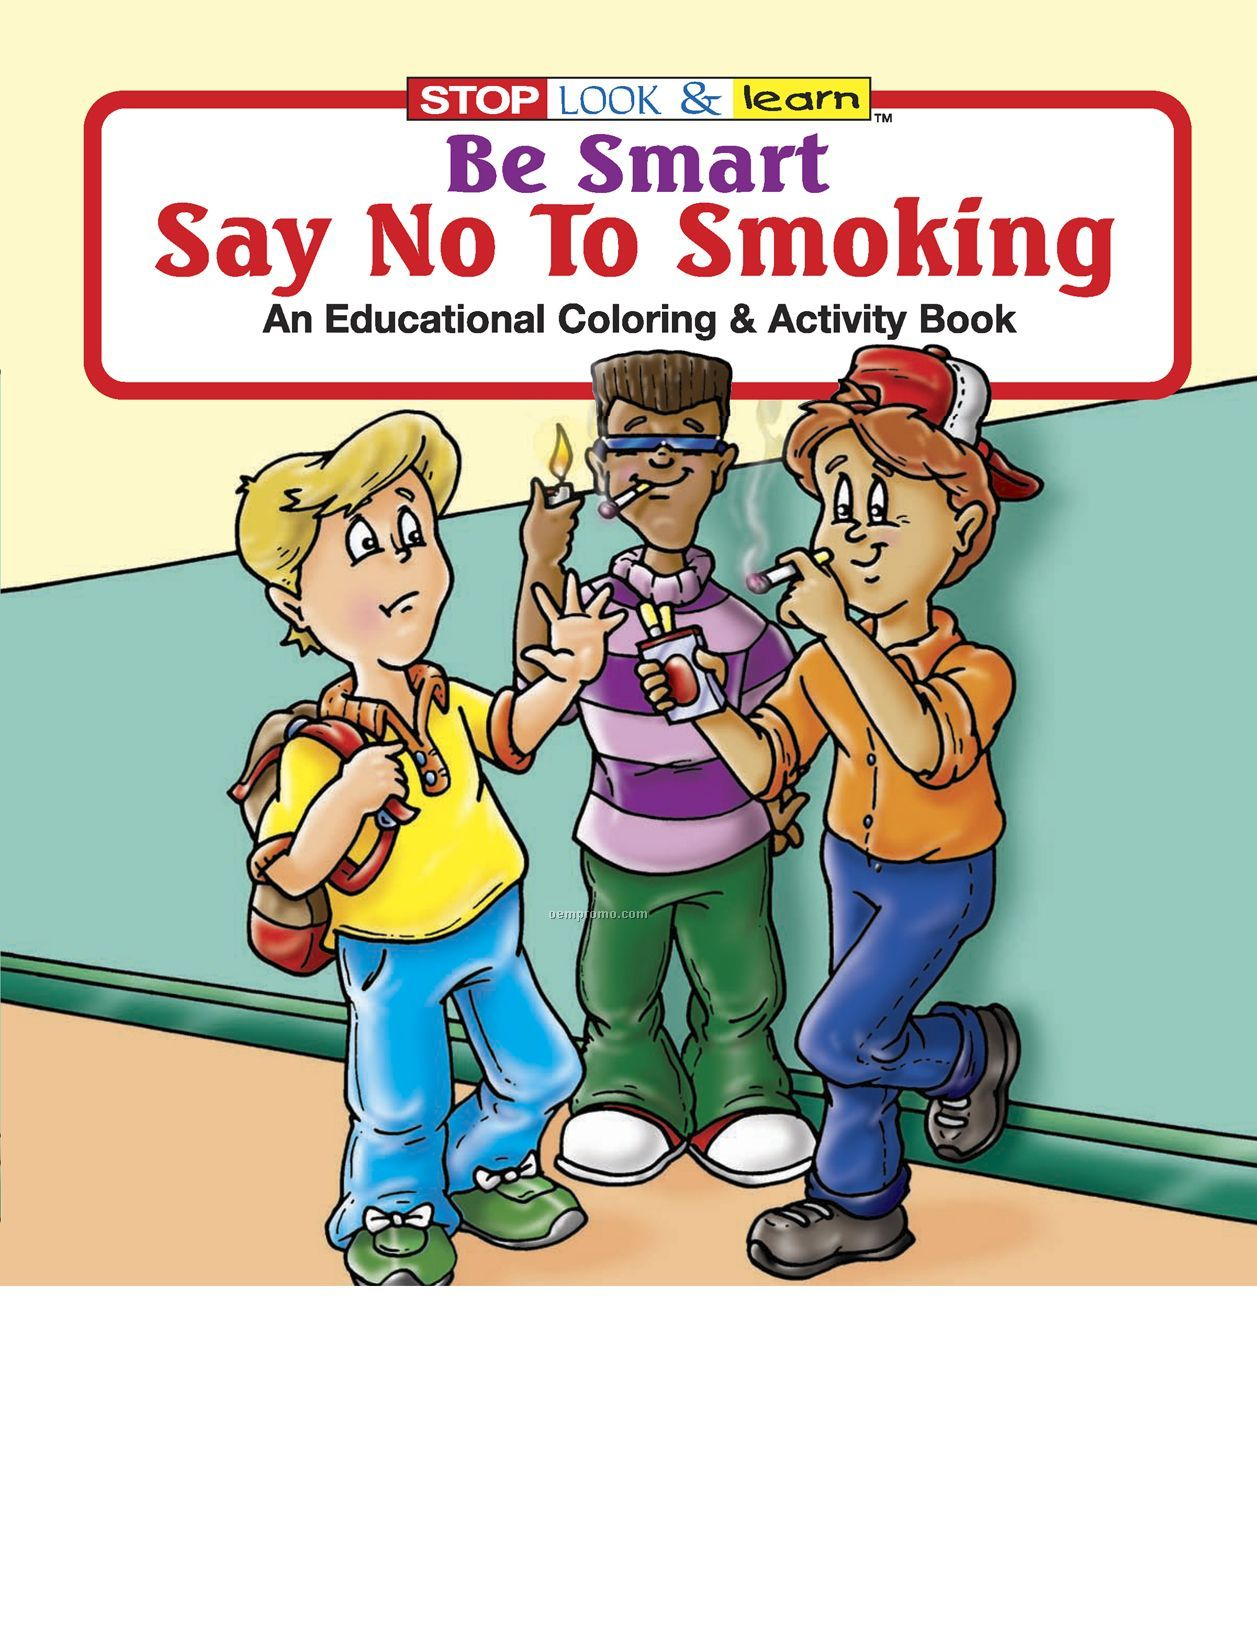 Be Smart, Say No To Smoking Coloring Book